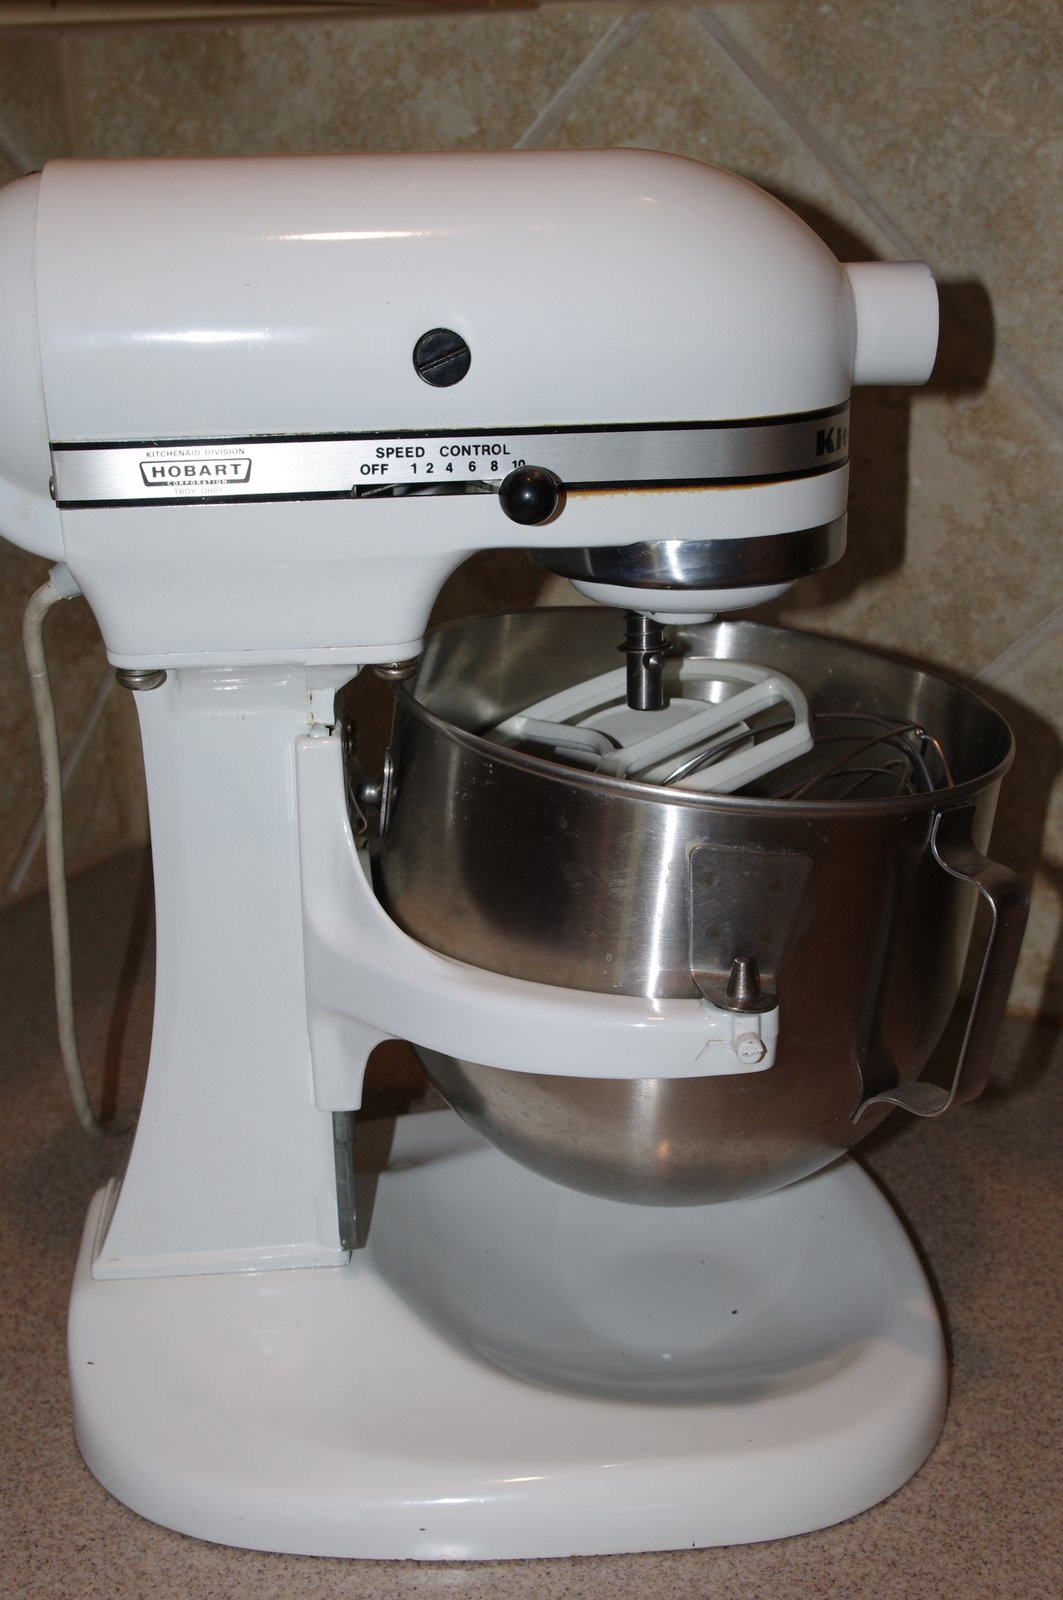 kitchen aid k5ss home designs kitchenaid stand mixer instruction manual books hobart model k5 a